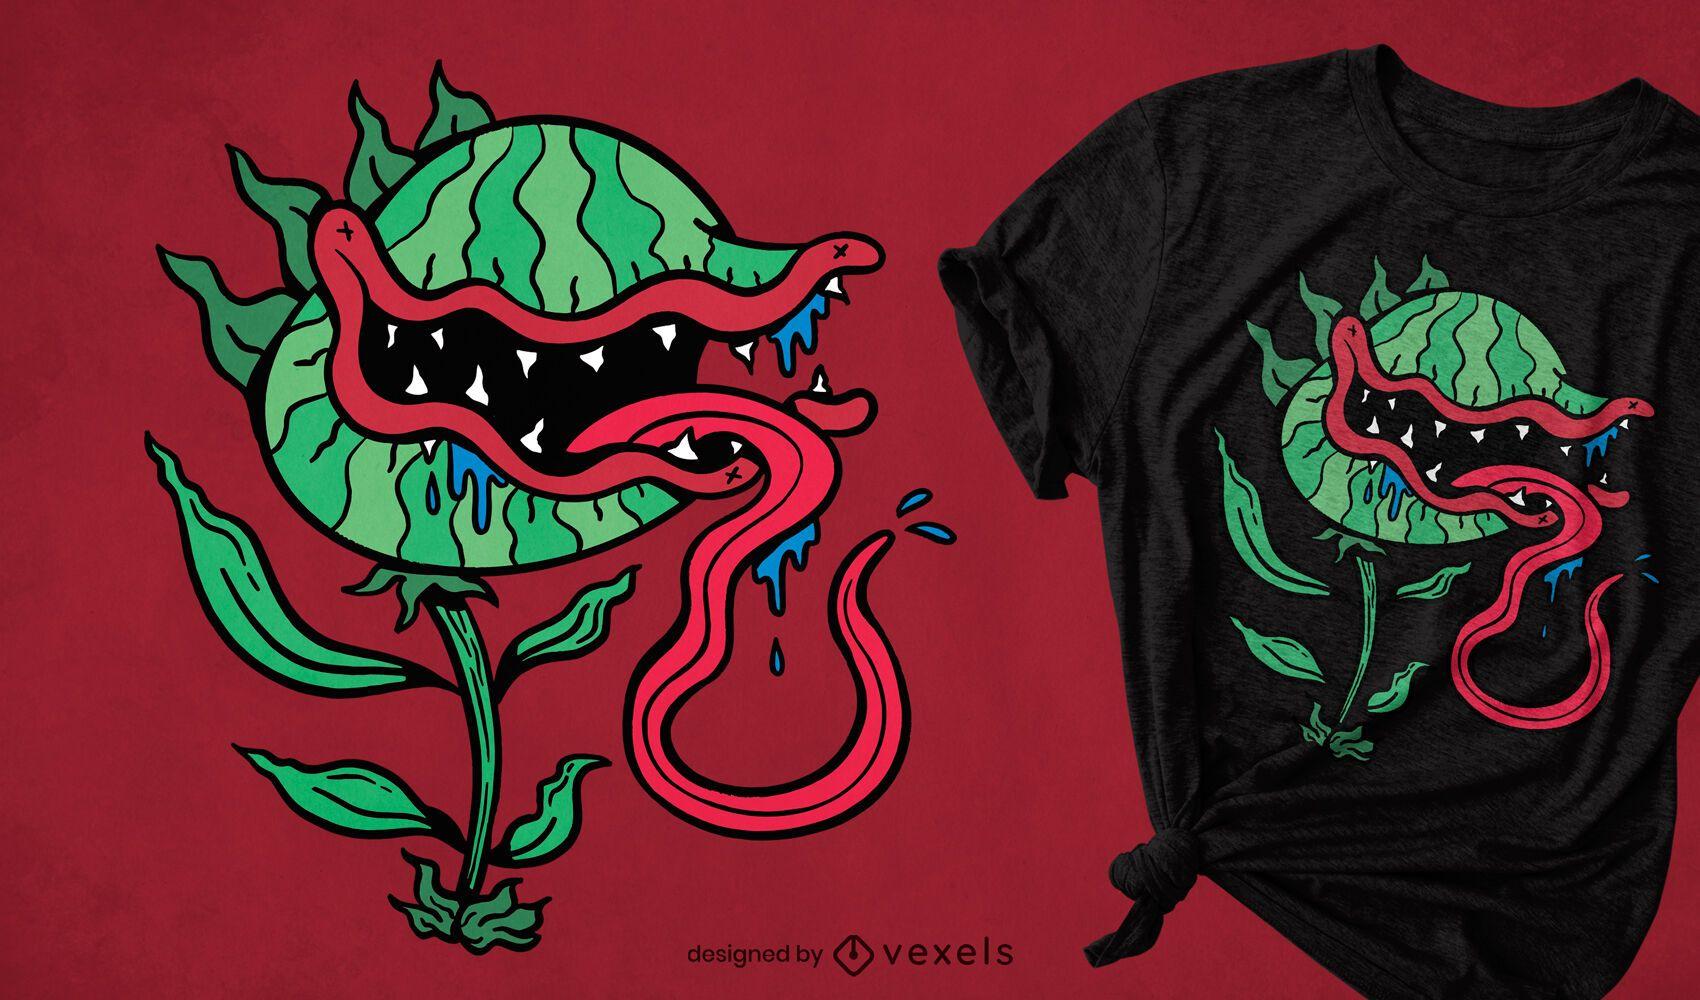 Diseño de camiseta de dibujos animados de plantas carnívoras.